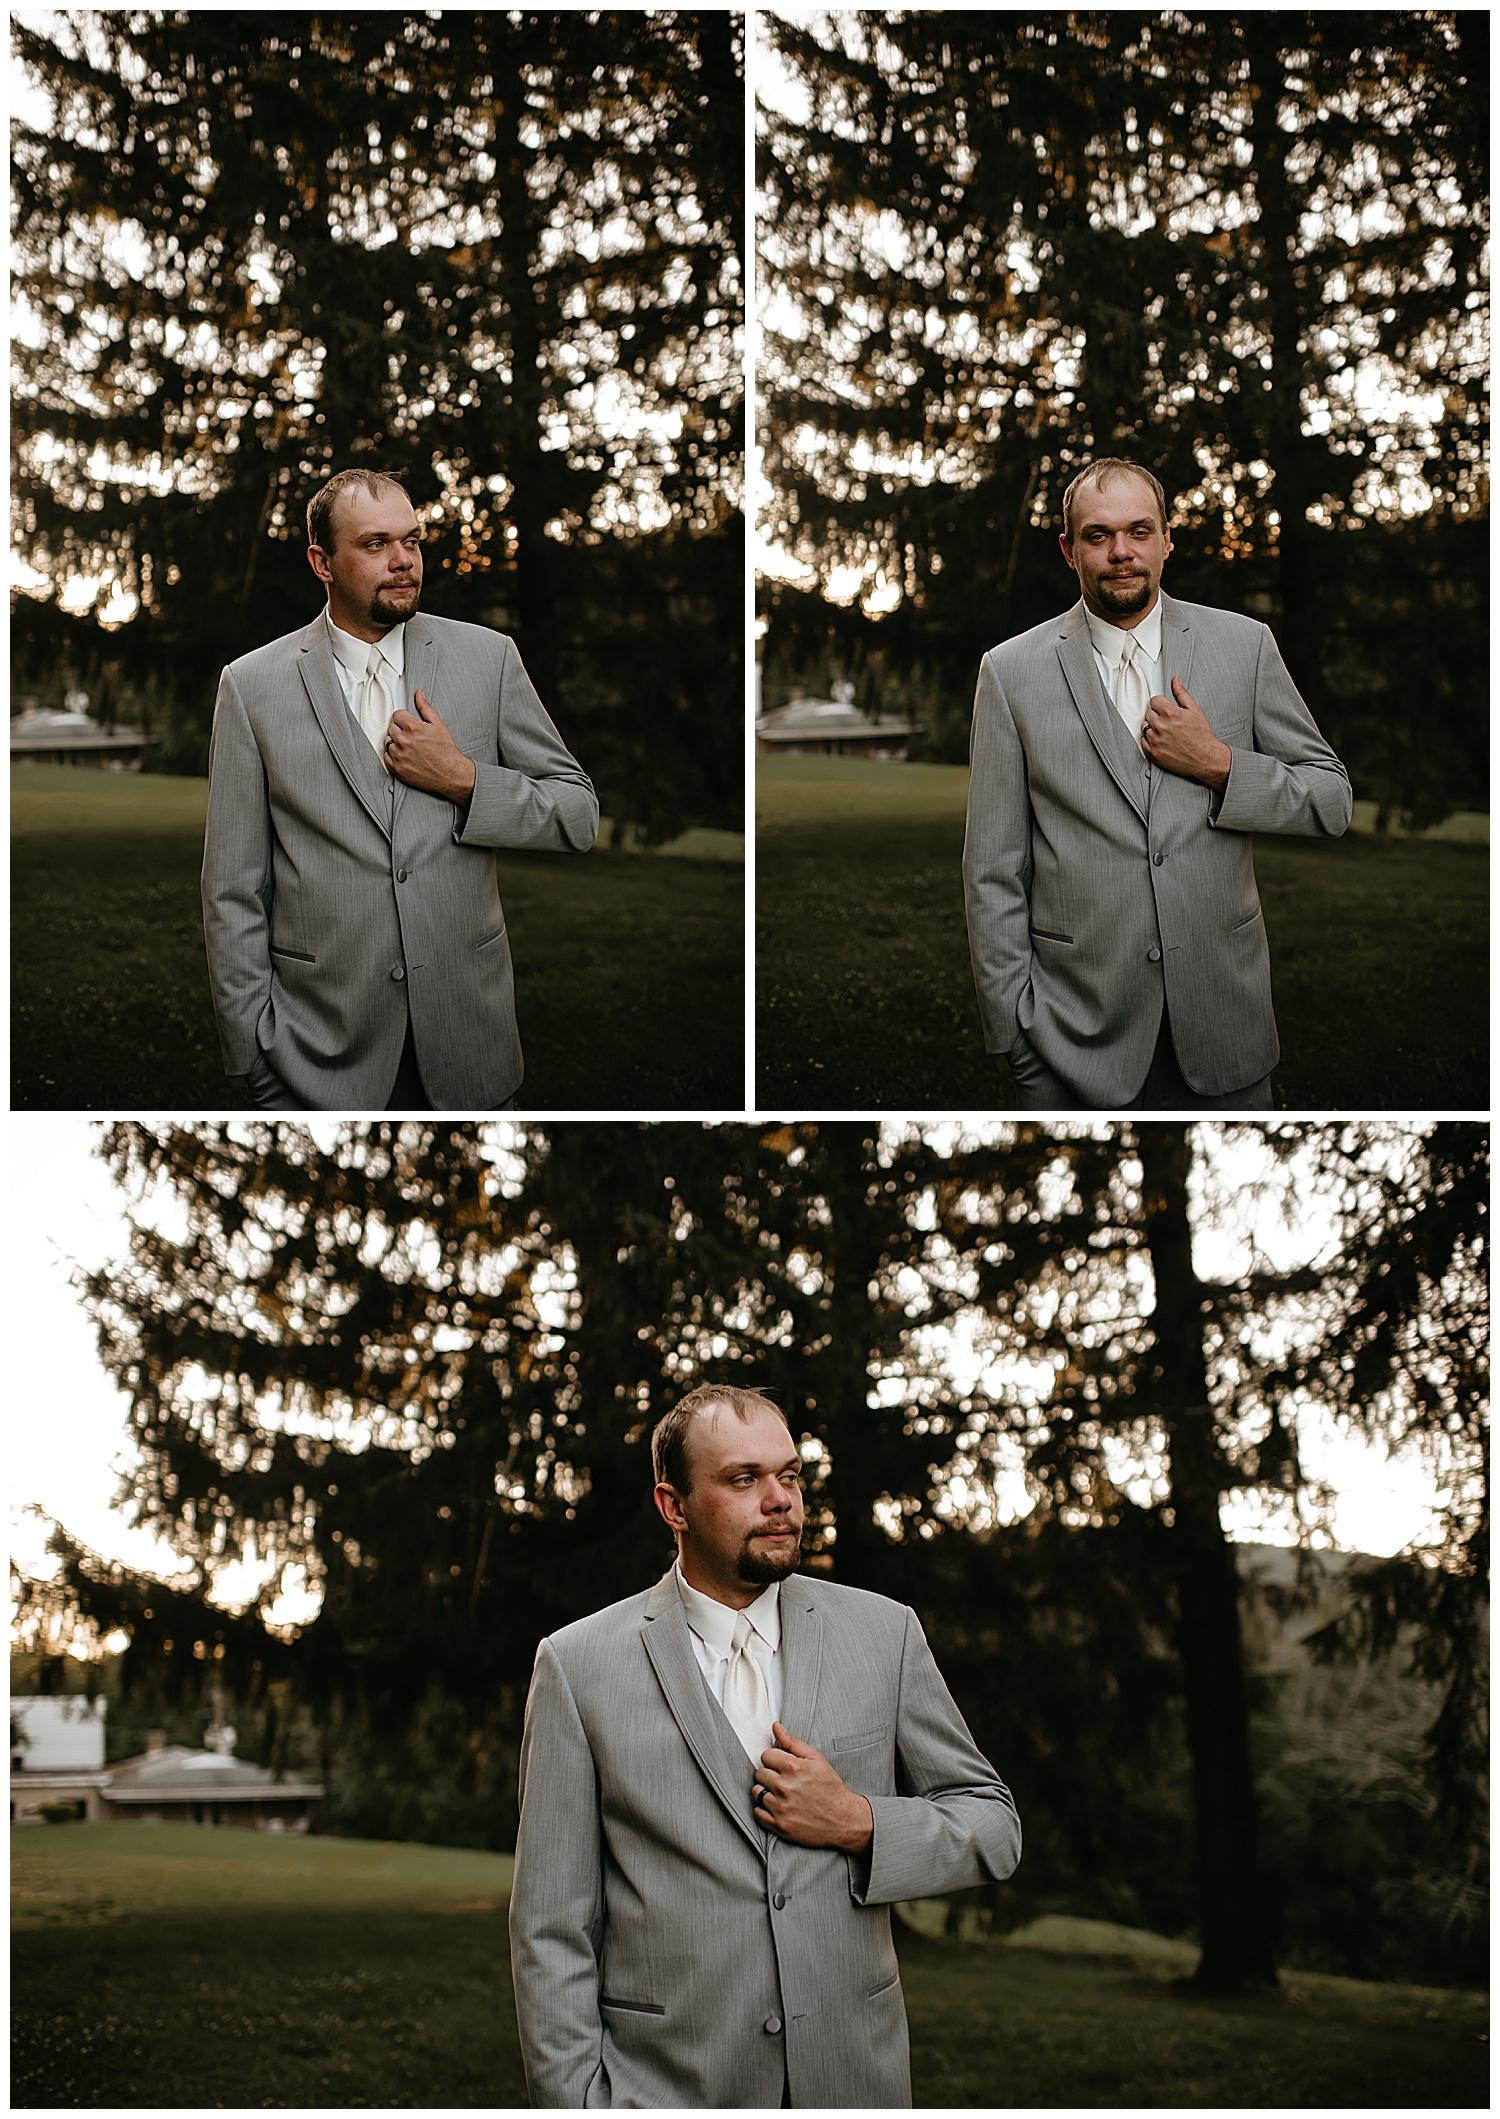 NEPA-Lehigh-Valley-Wedding-Photographer-at-Fountain-Springs-Country-Inn-Ashland-PA_0065.jpg